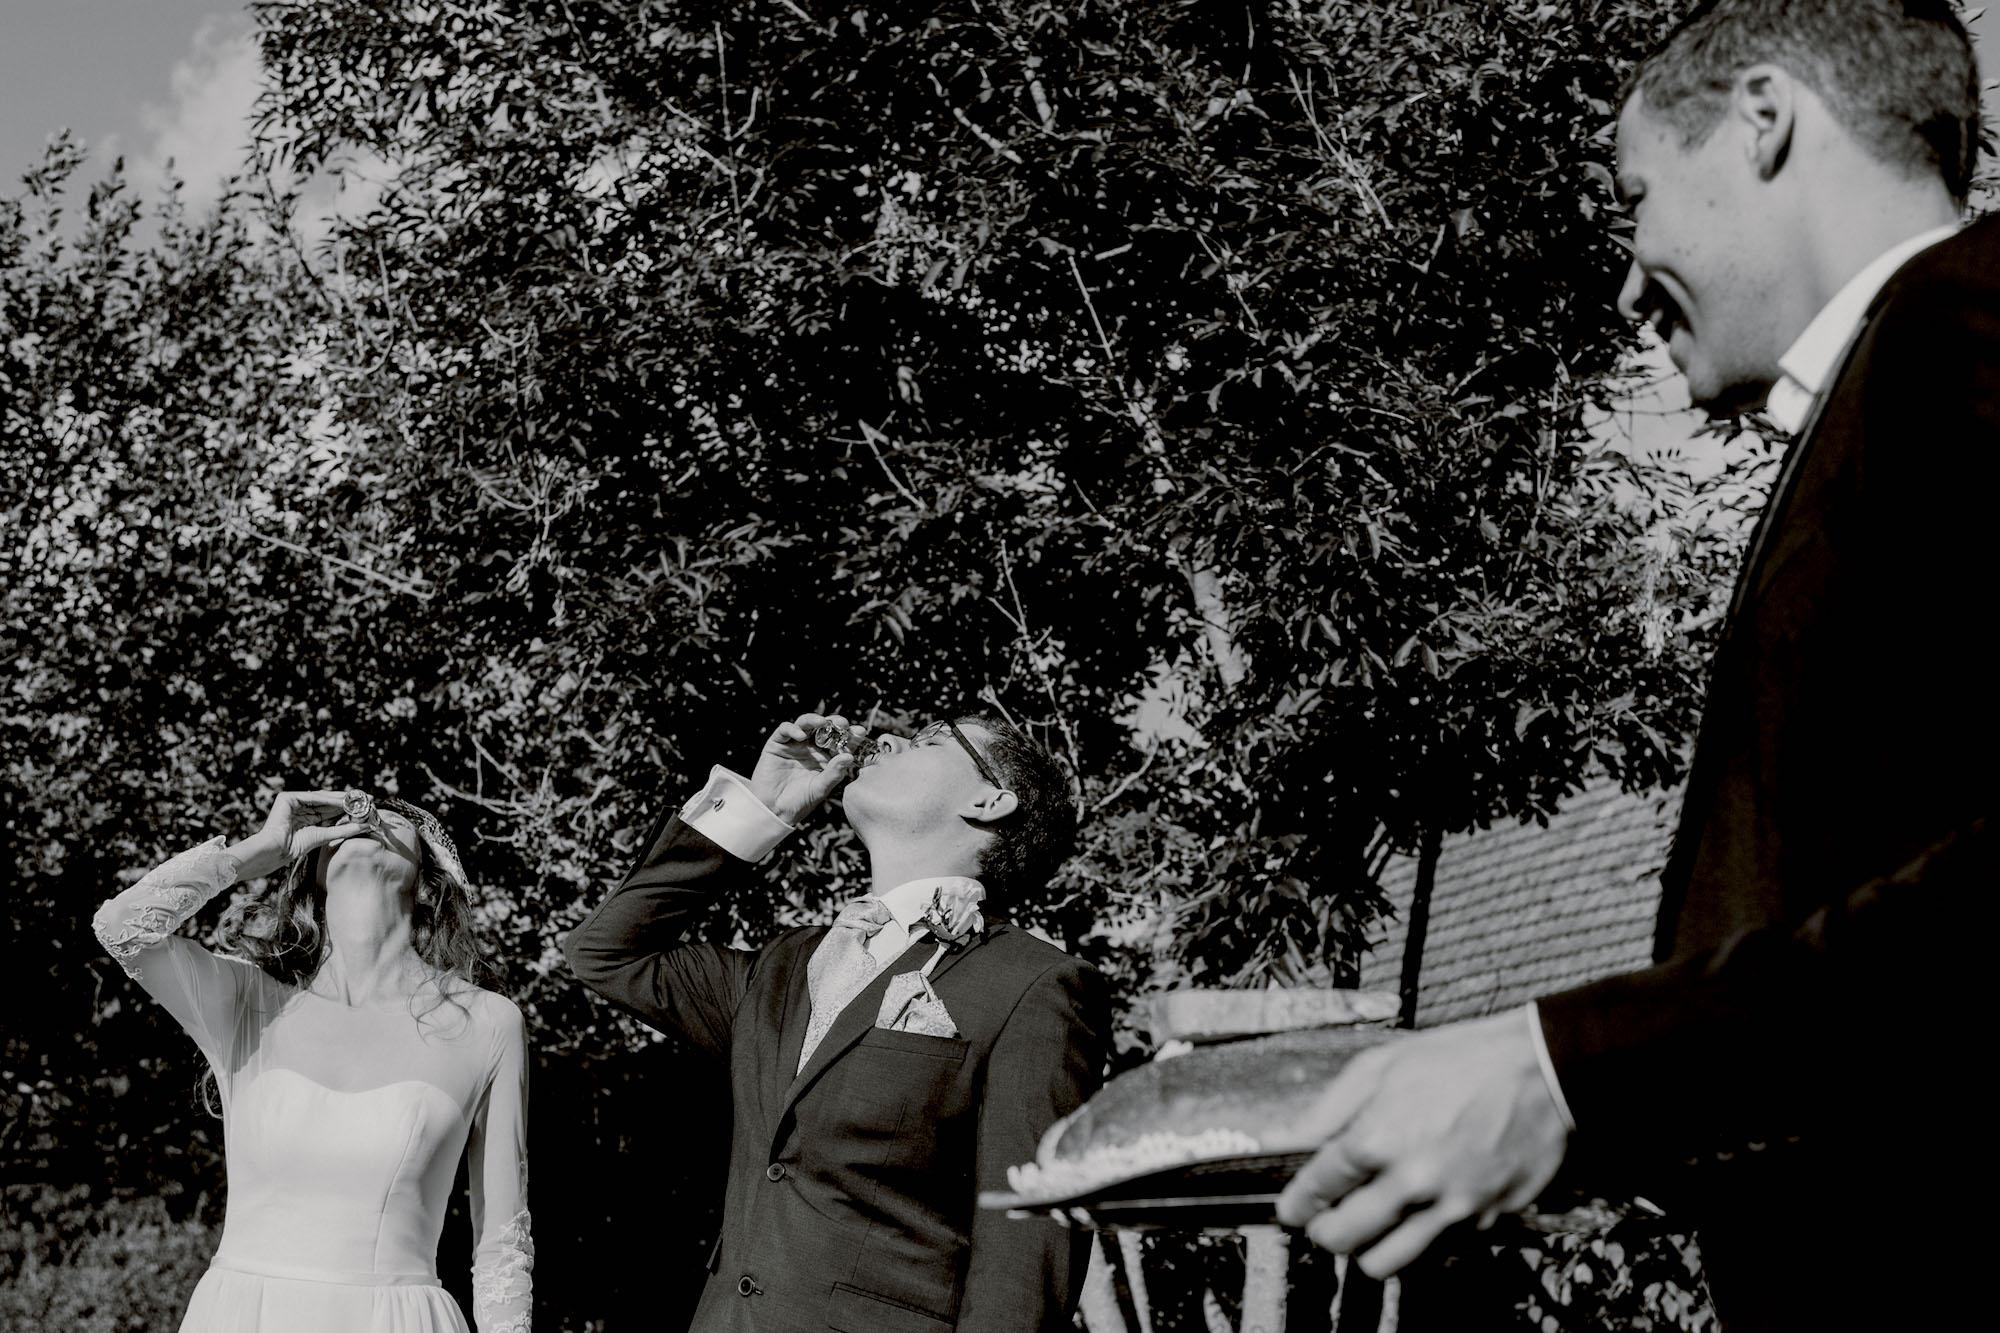 mariage polonais france 9 - Dagmara Bojenko - Eco-conscious Weddings, Births & Families